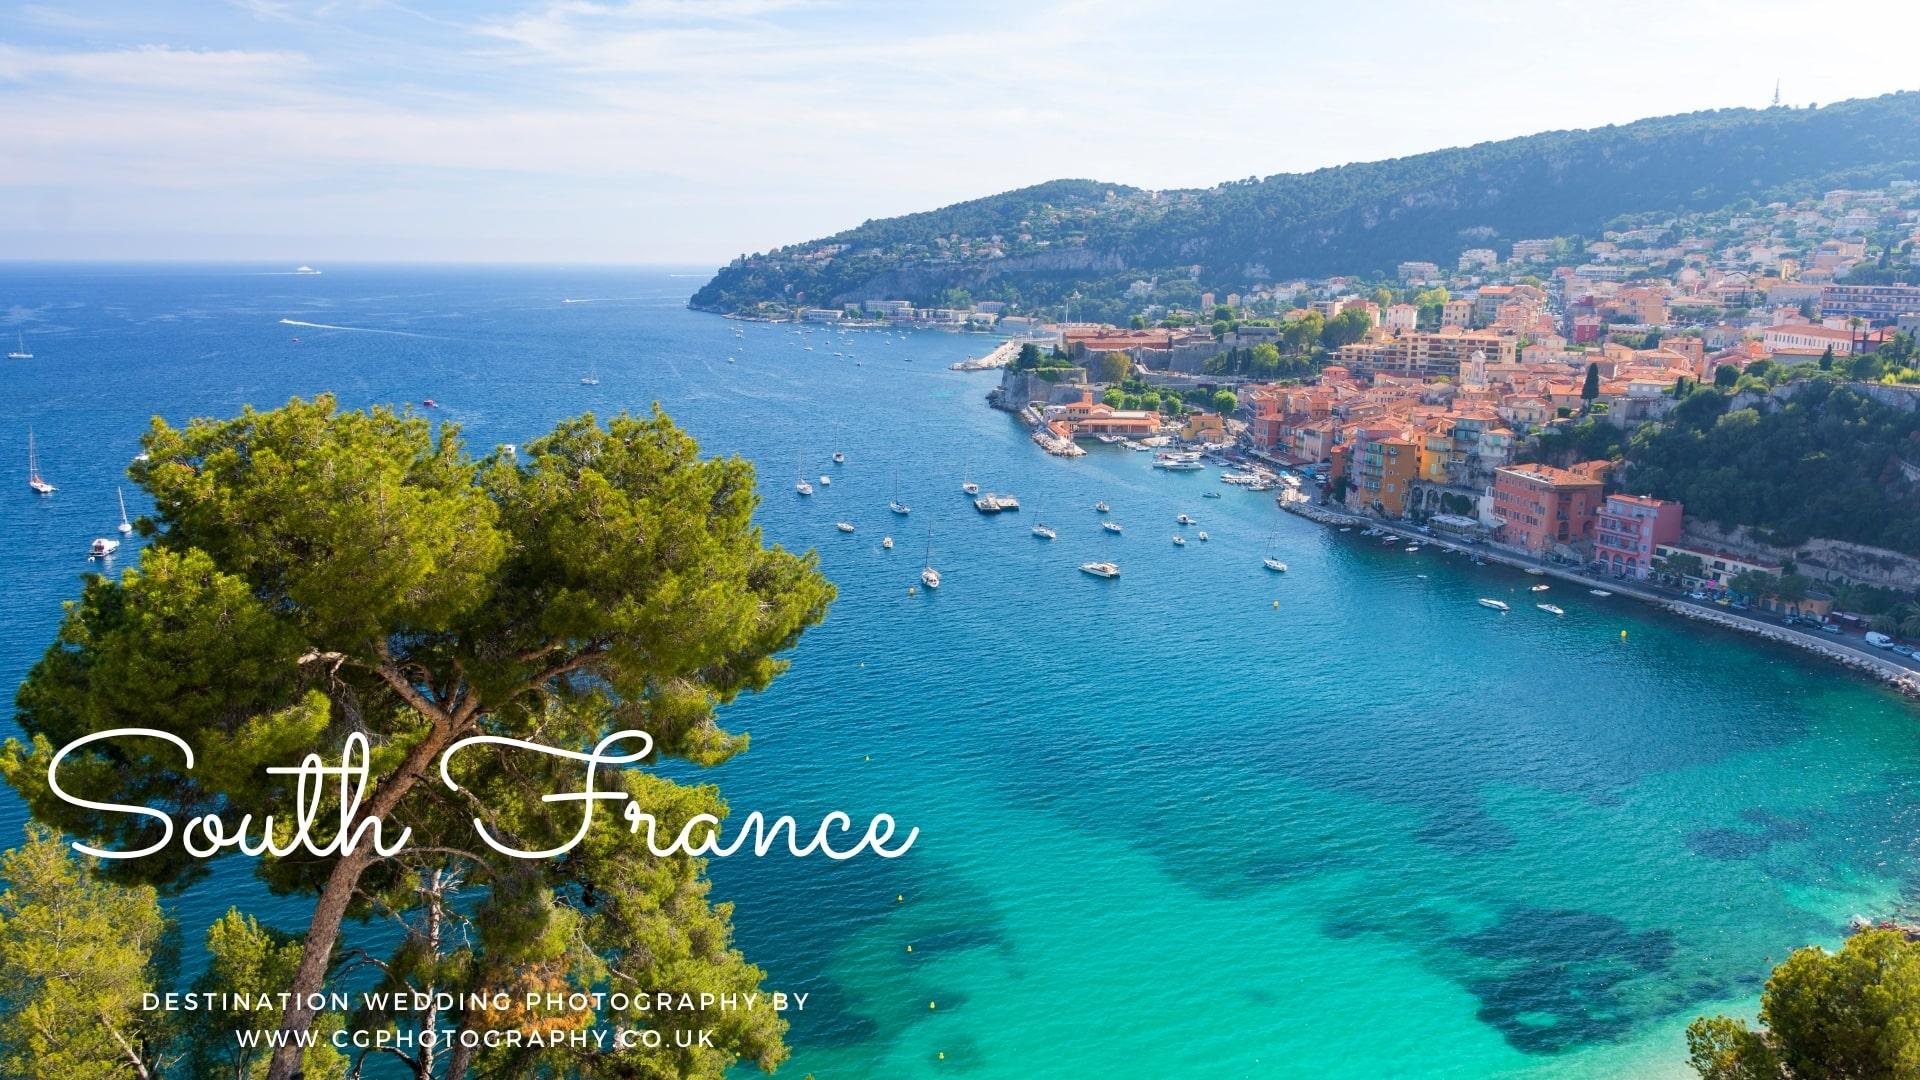 South France Wedding Photographer